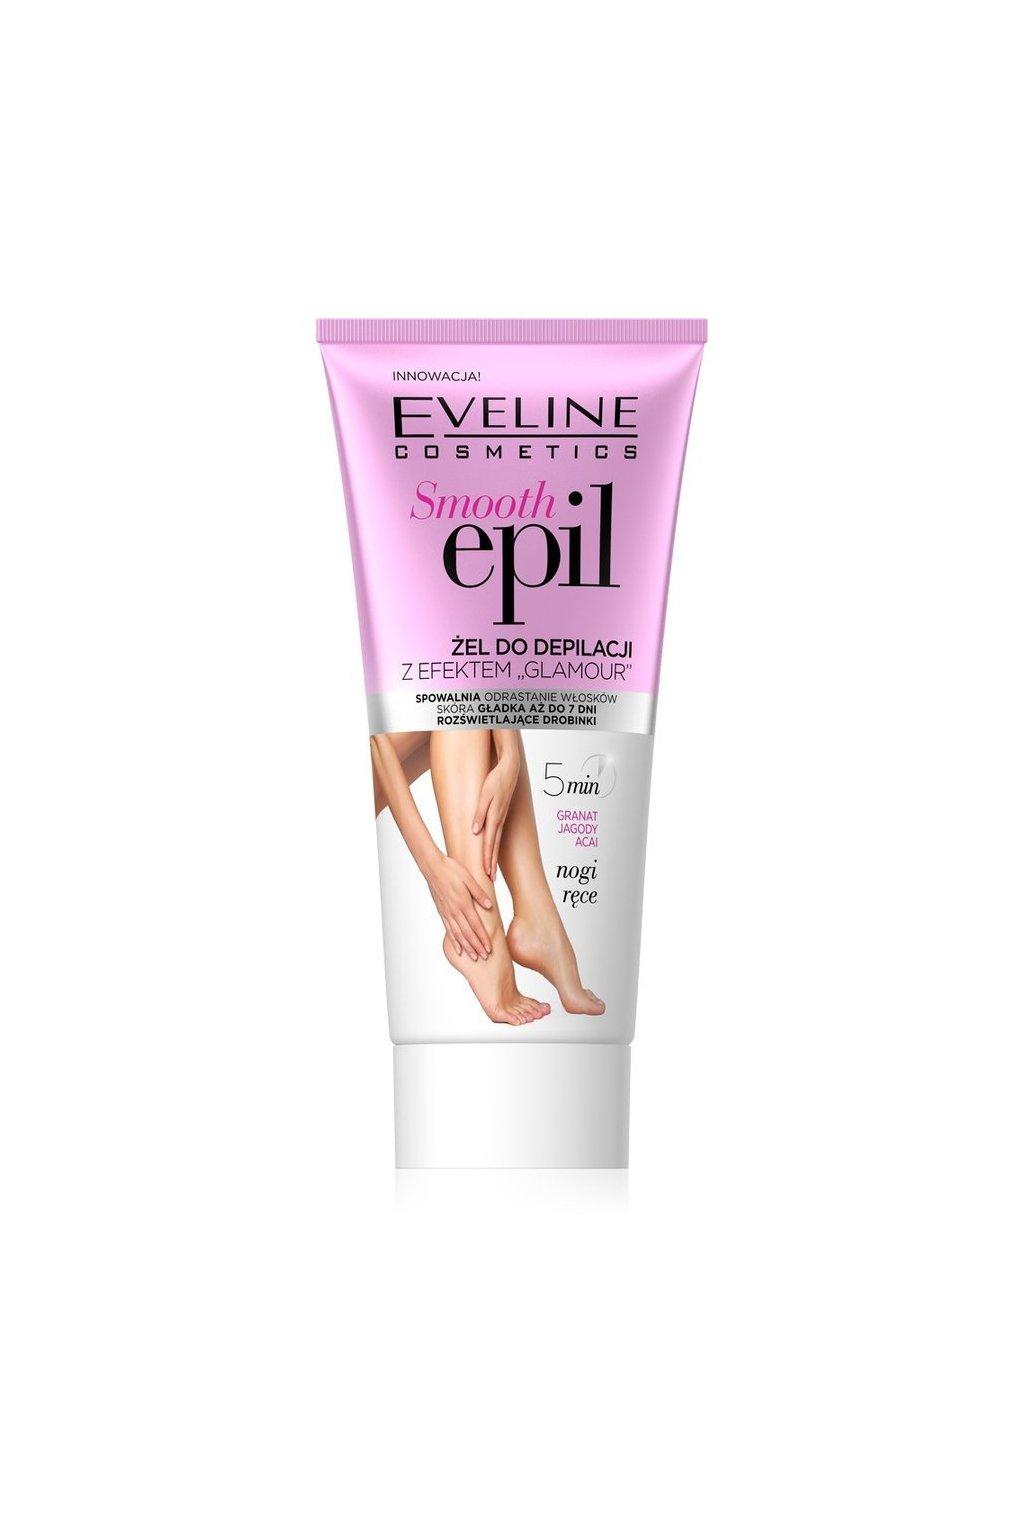 Eveline cosmetics Smooth Smooth Epil depilacní gel s glamour efektem 175ml 65508 1